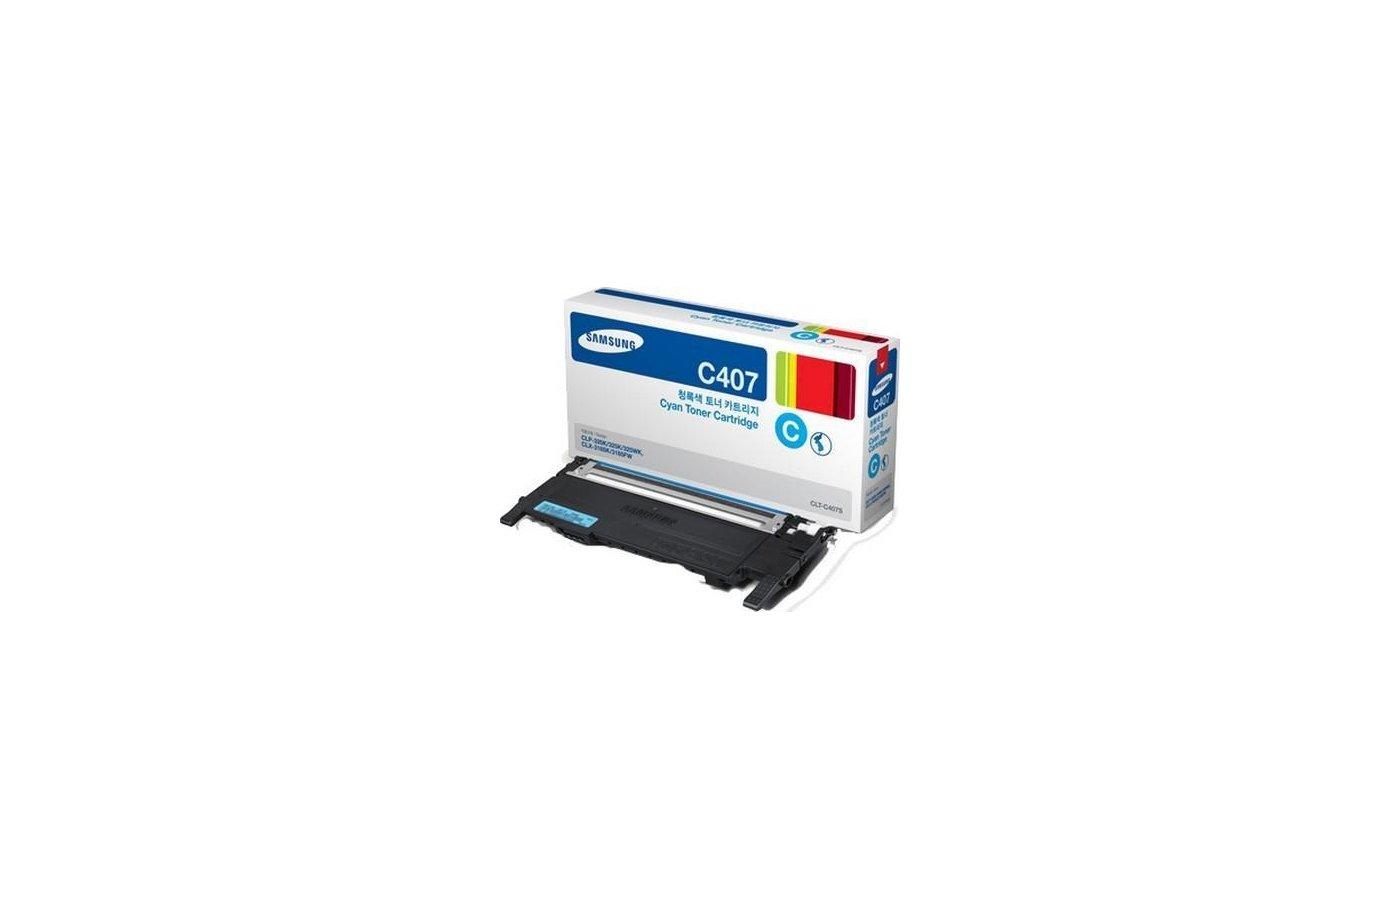 Картридж лазерный Samsung CLT-C407S голубой для CLP-320/320N/325 / CLX-3185/3185N/3185FN (1000стр.)